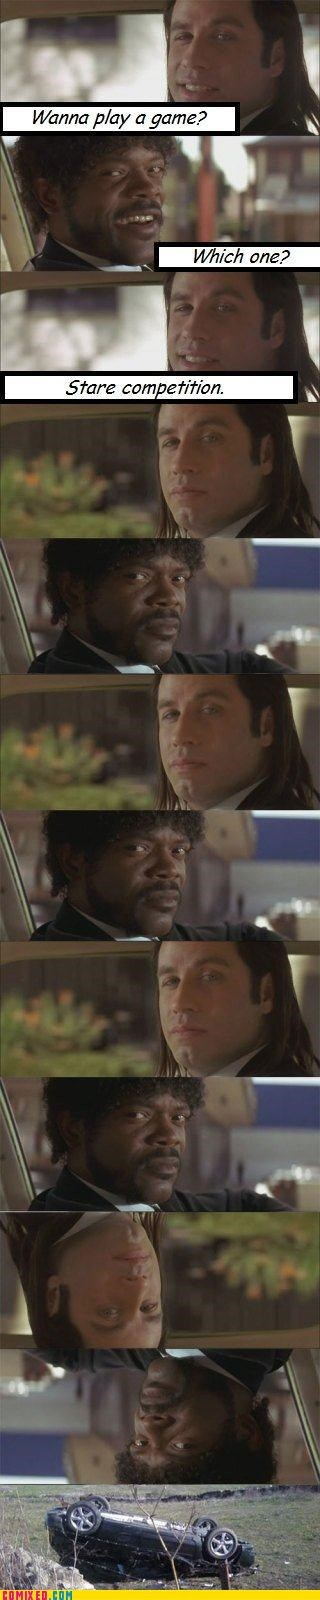 car accident,From the Movies,idiots,john travolta,pulp fiction,Samuel L Jackson,stare contest